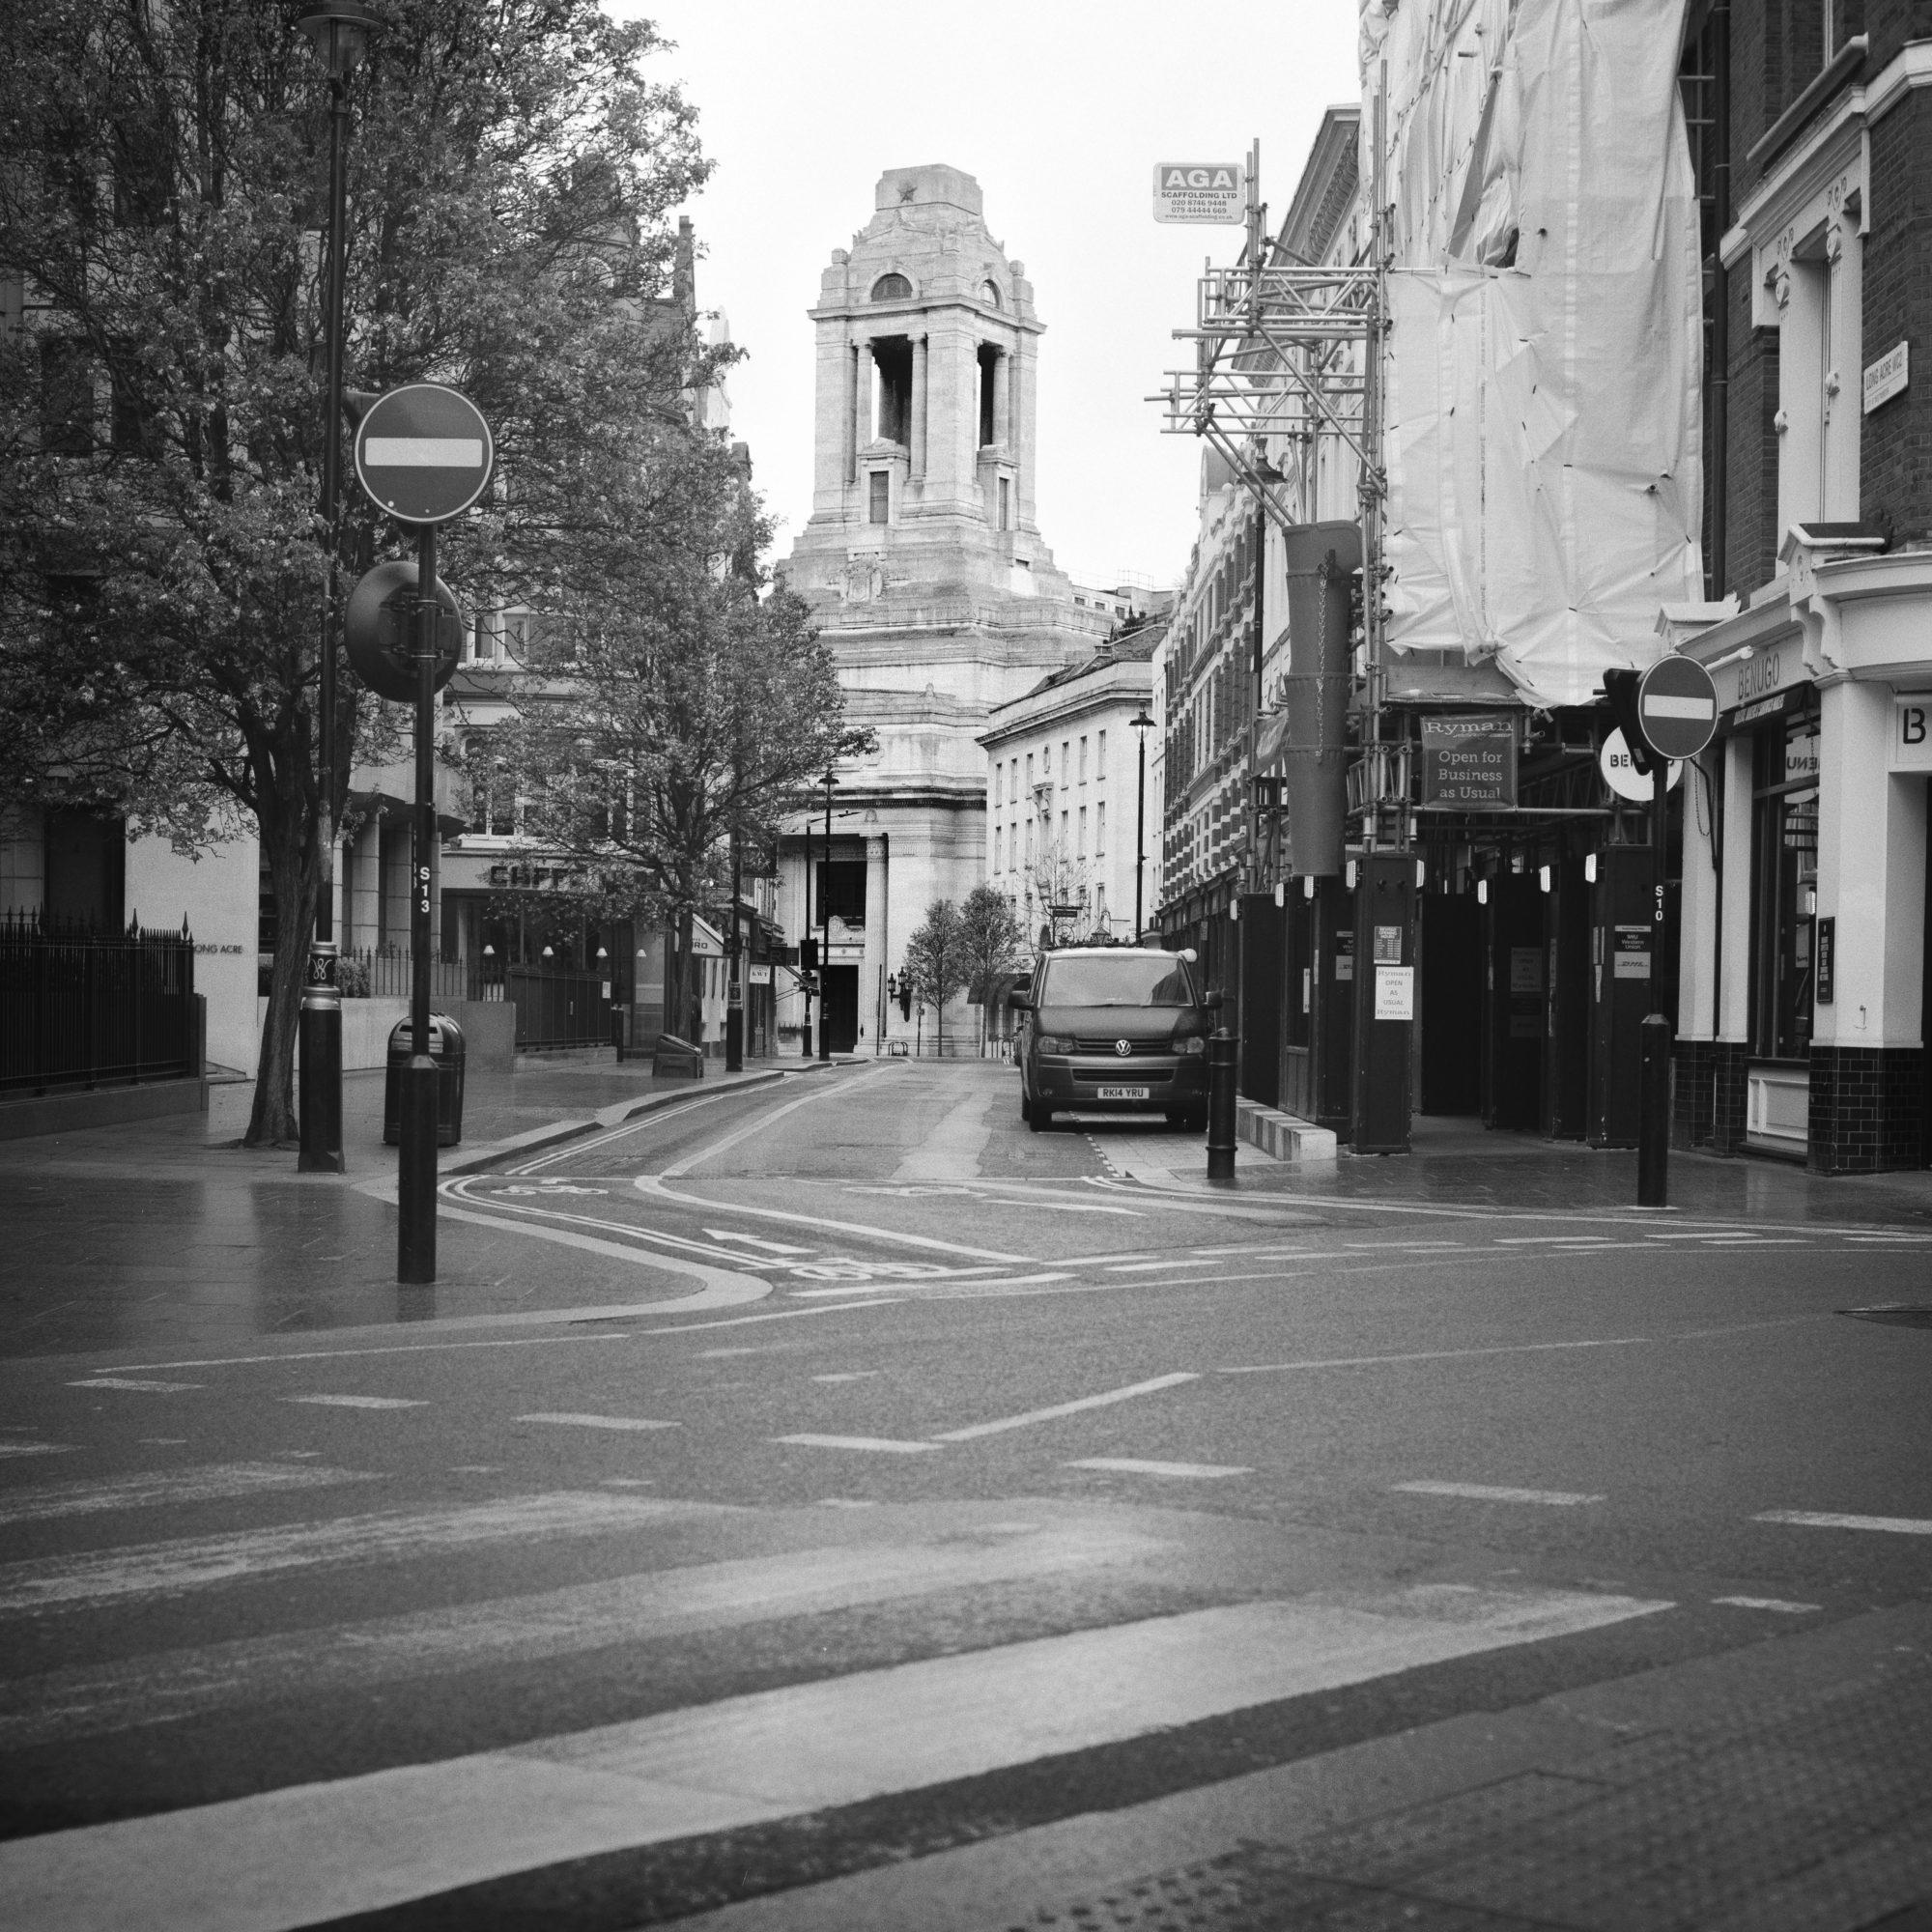 Empty street (Pic: Giacomo Mantovani)